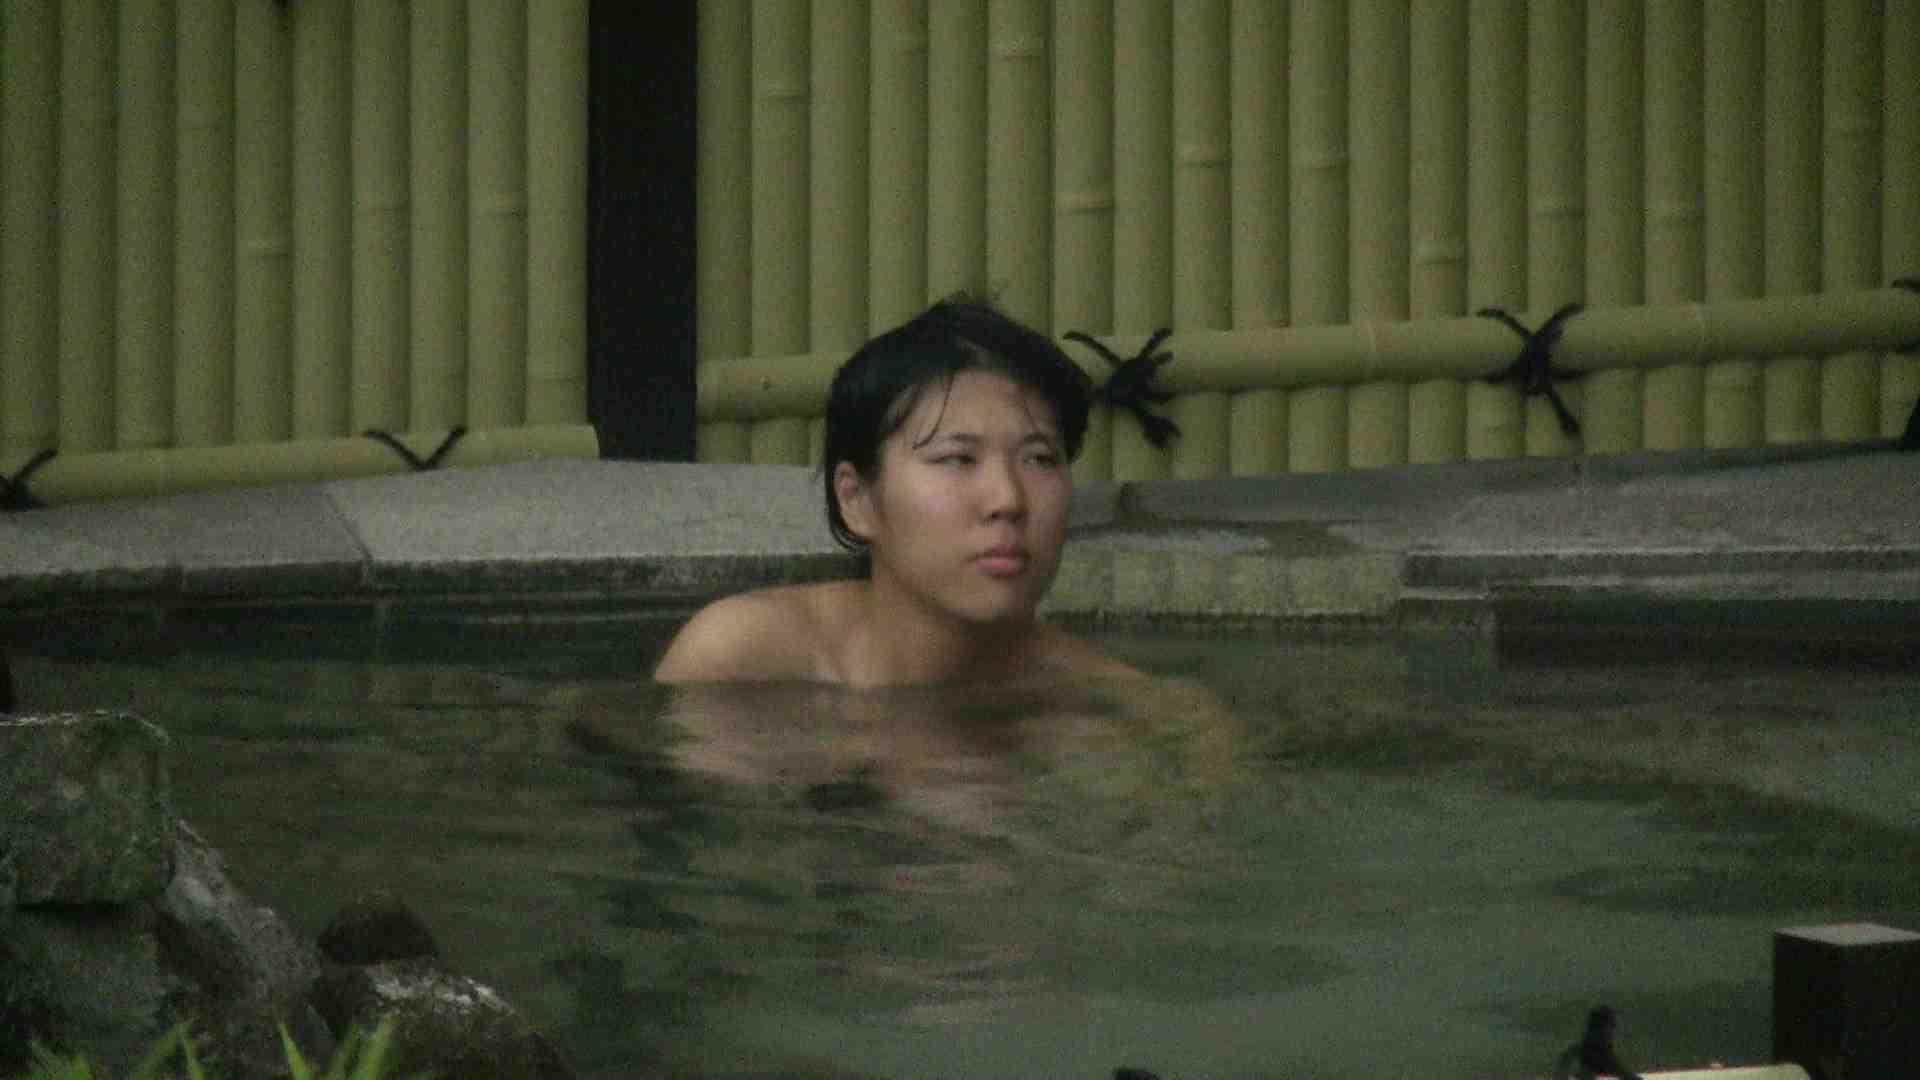 Aquaな露天風呂Vol.215 綺麗なOLたち  106枚 33